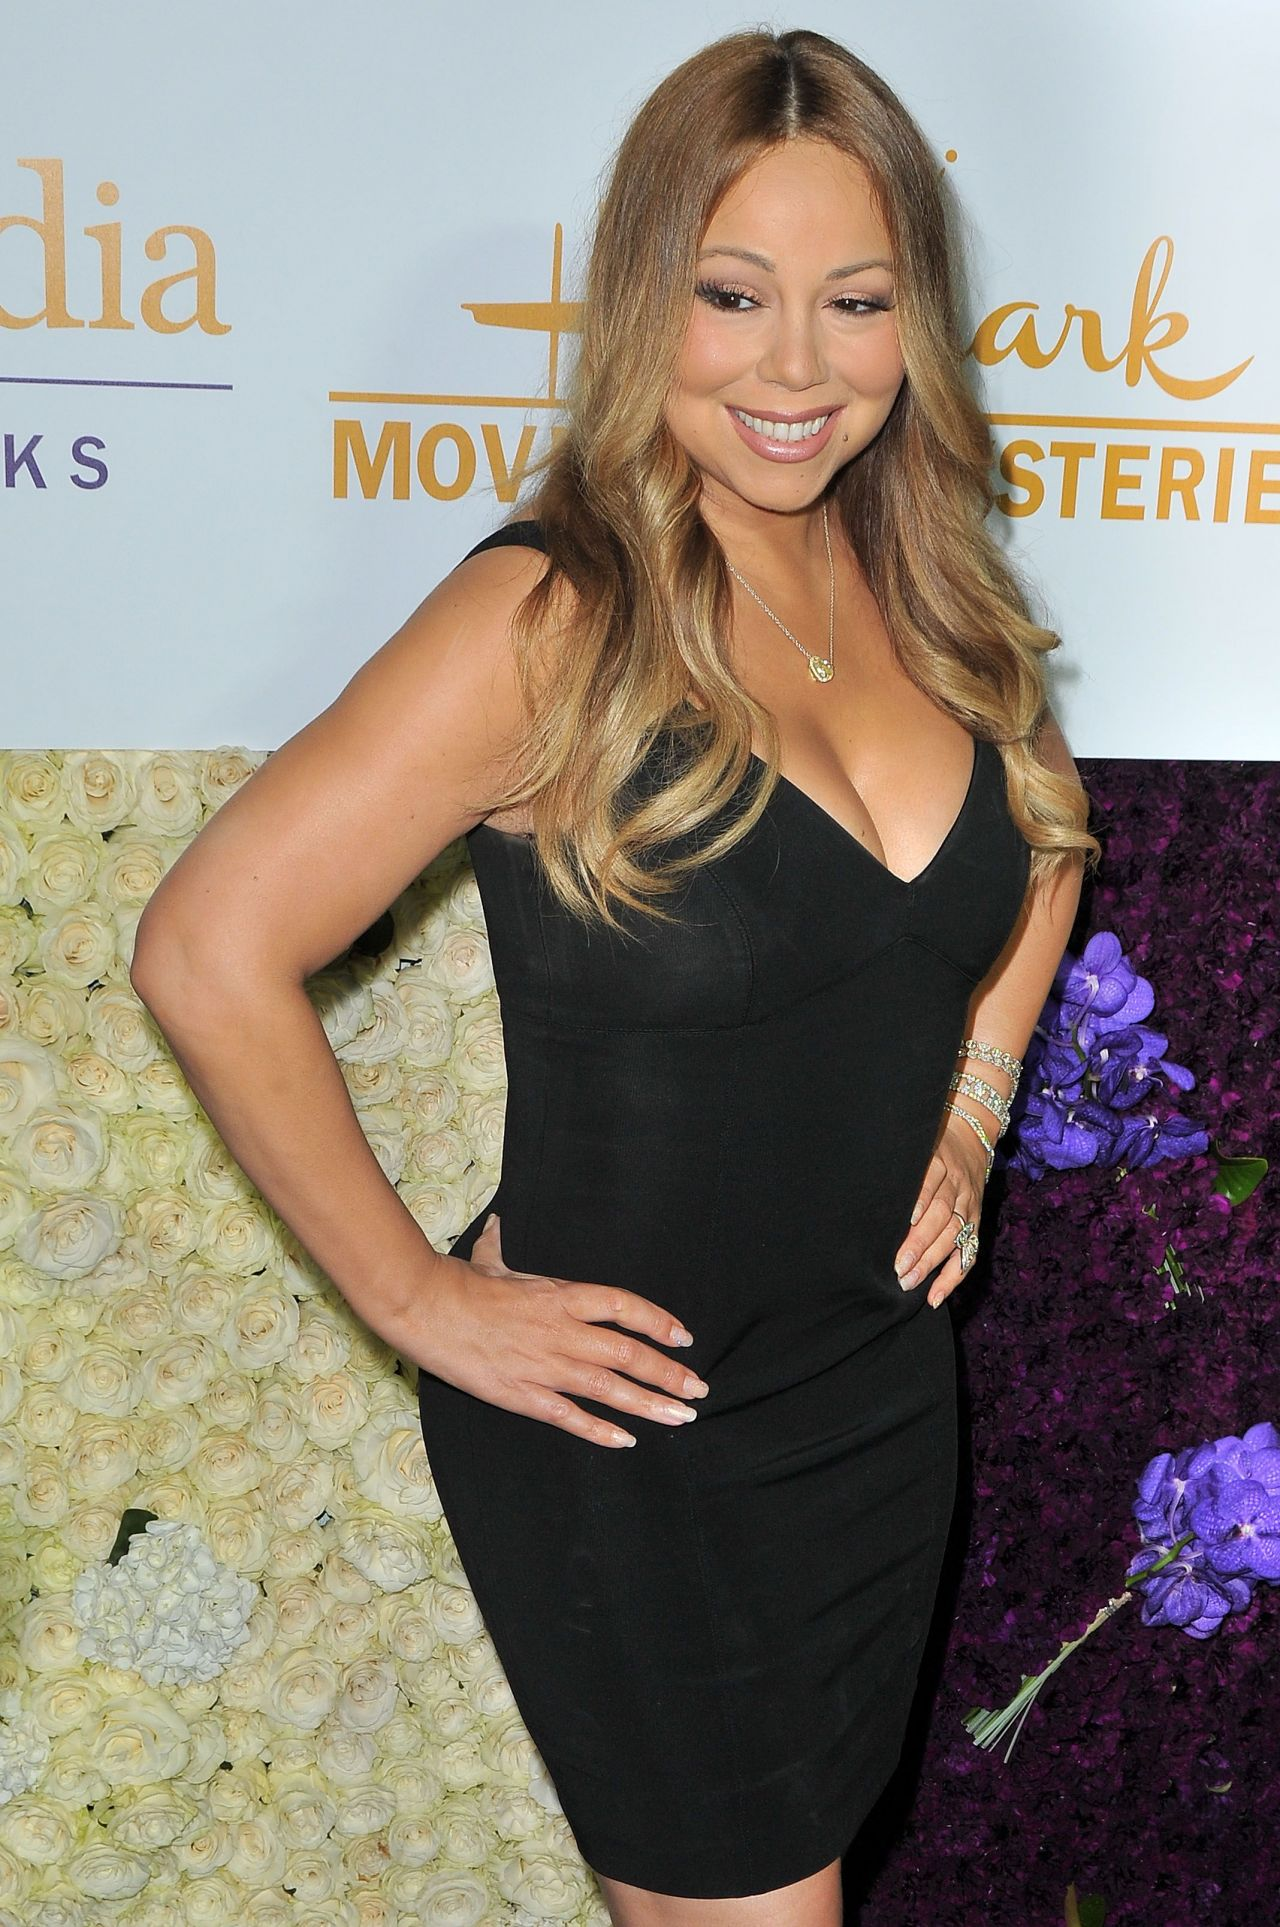 Mariah Carey Hallmark Channel 2015 Summer Tca Tour Event